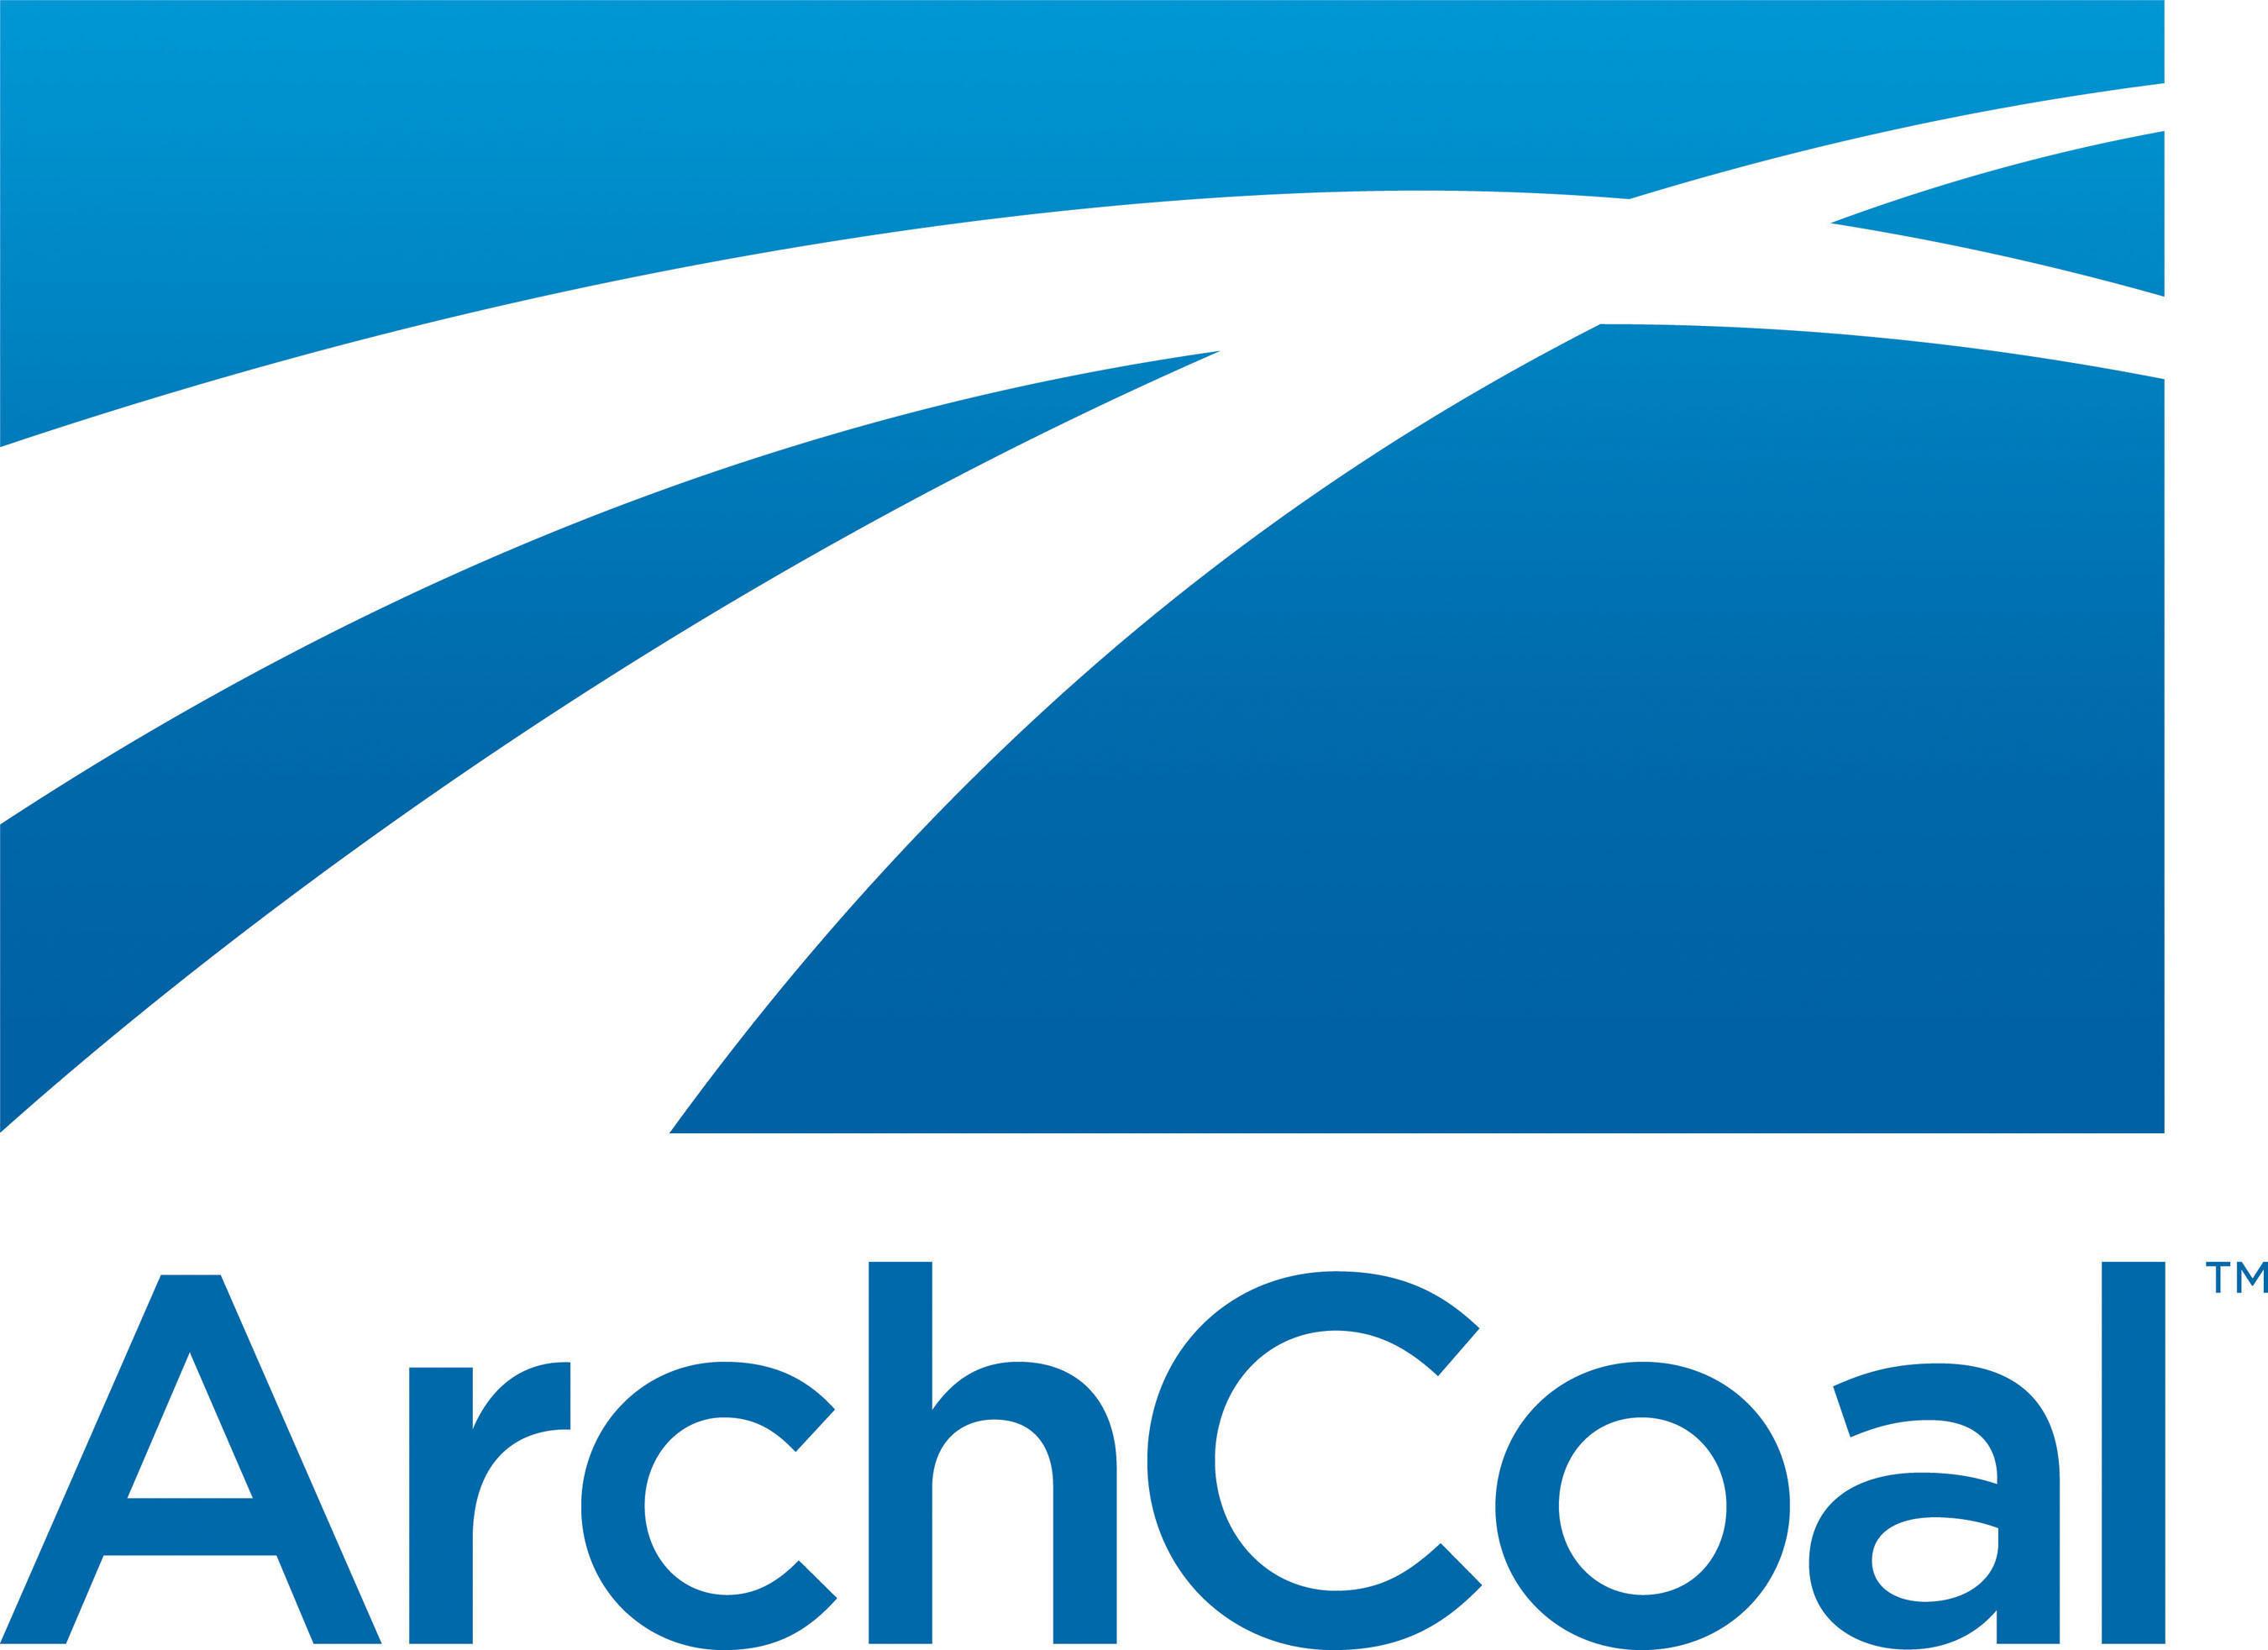 Arch Coal, Inc. Class A logo